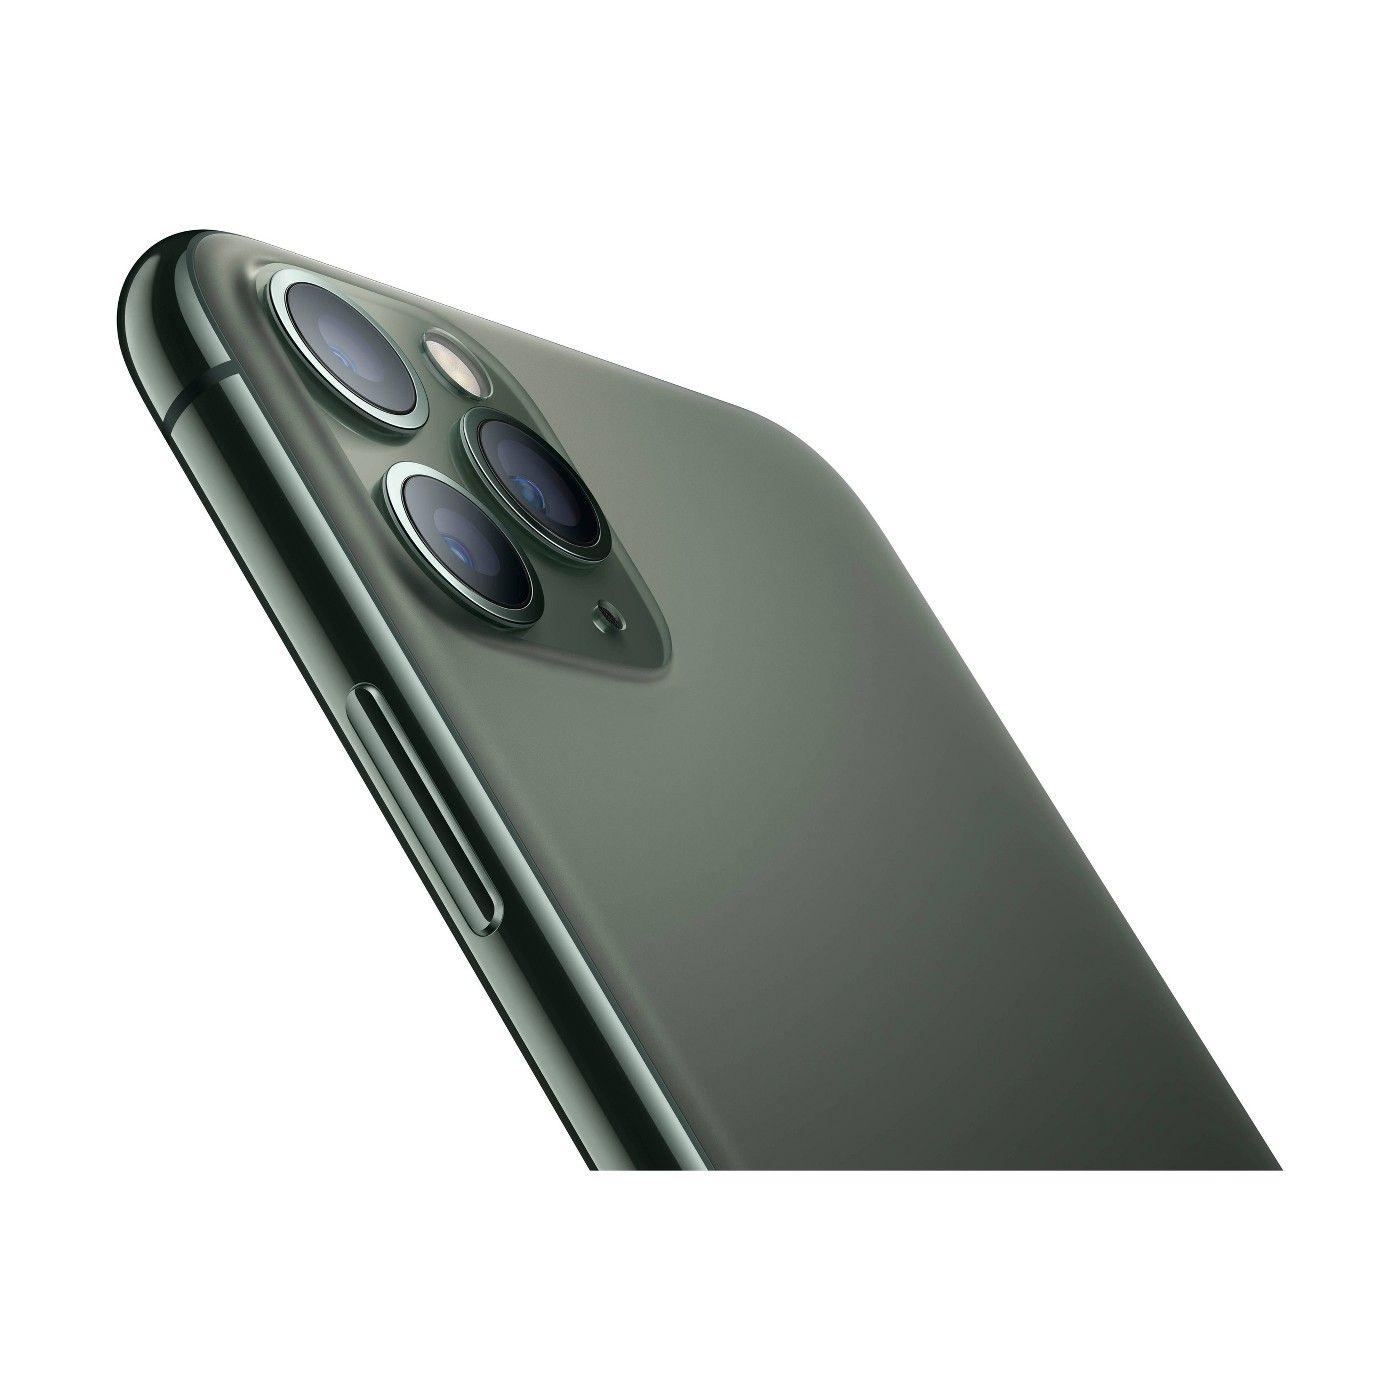 Apple Iphone 11 Pro Iphone 11 Apple Iphone 11 Pro Iphone